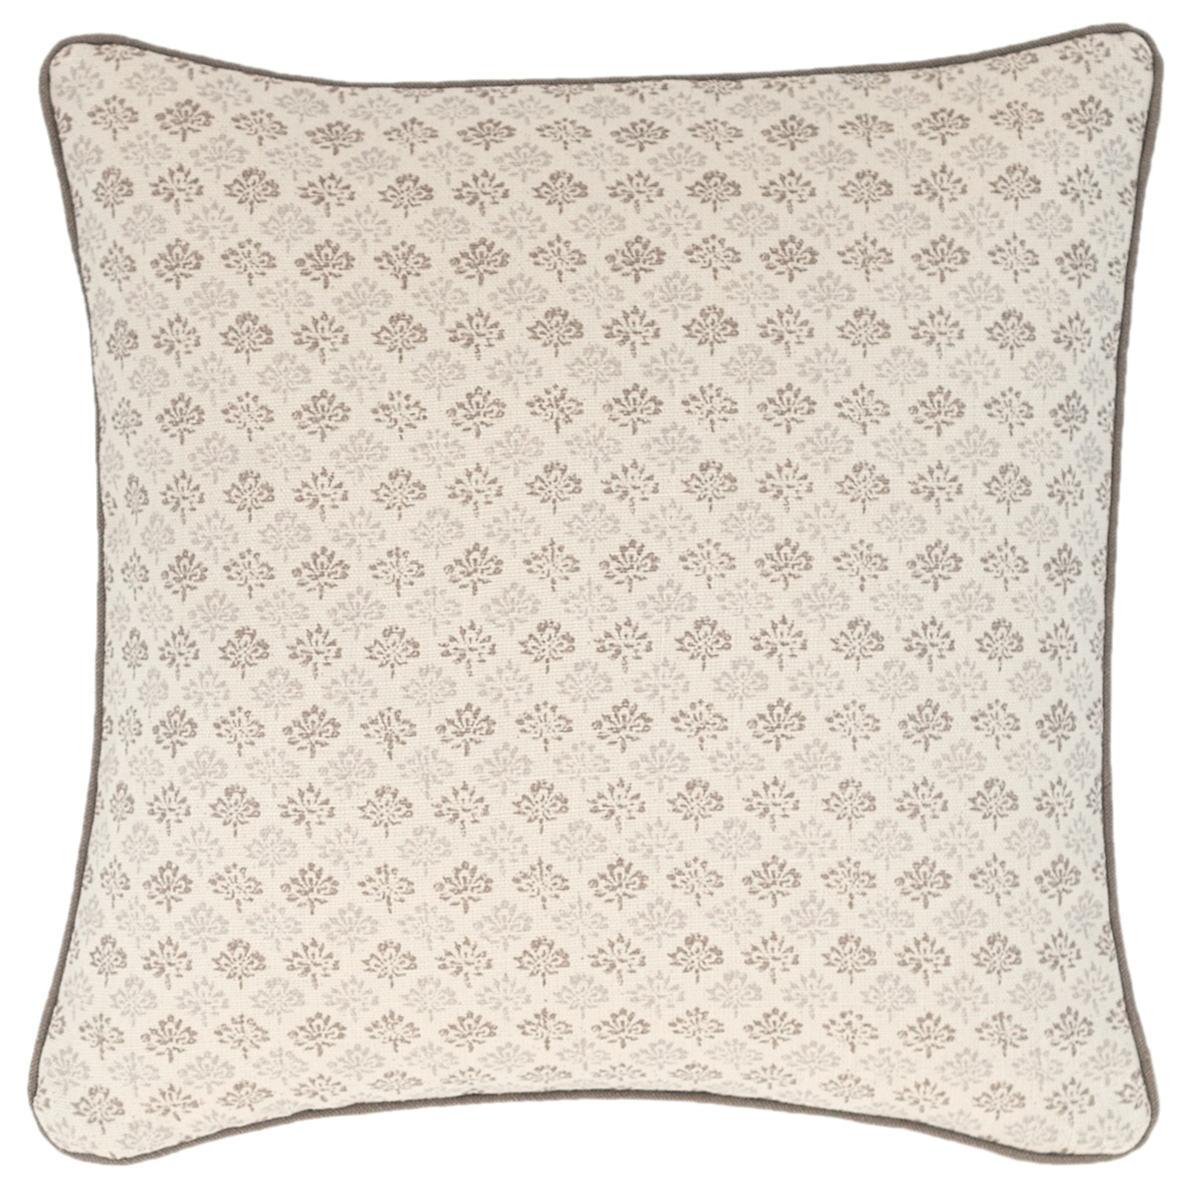 Aria Linen Zinc Decorative Pillow